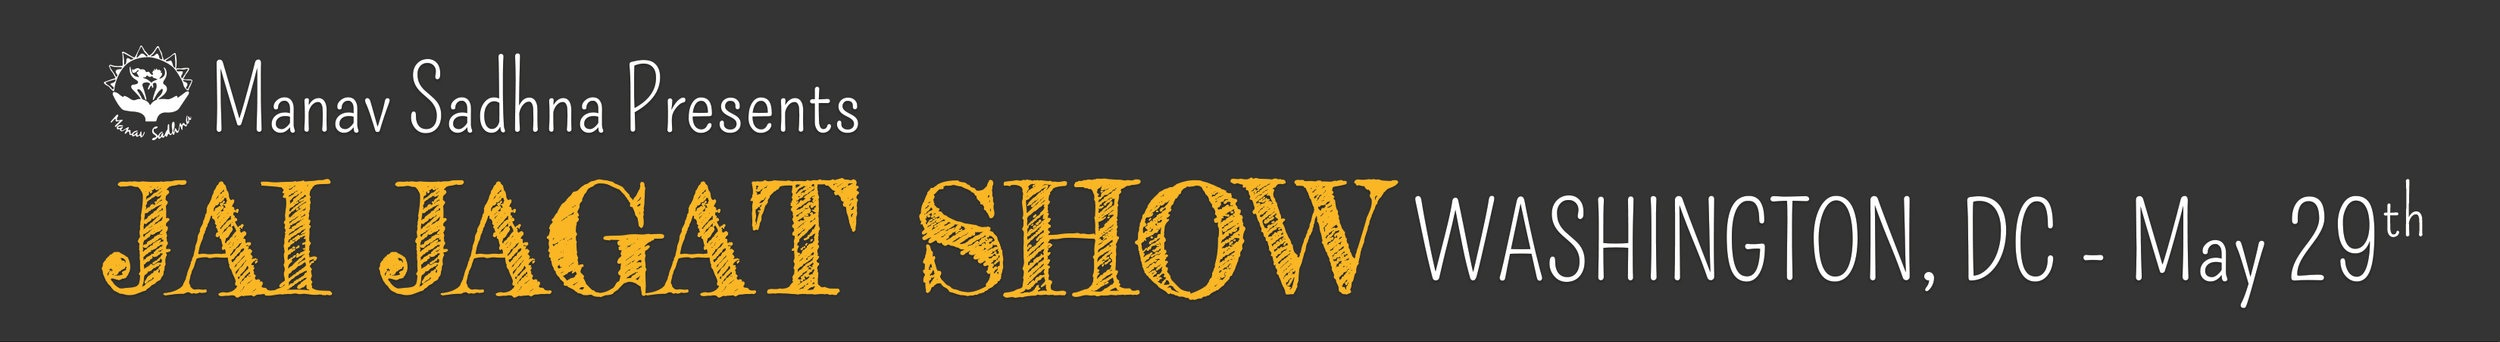 DC-flyer---logo.jpg